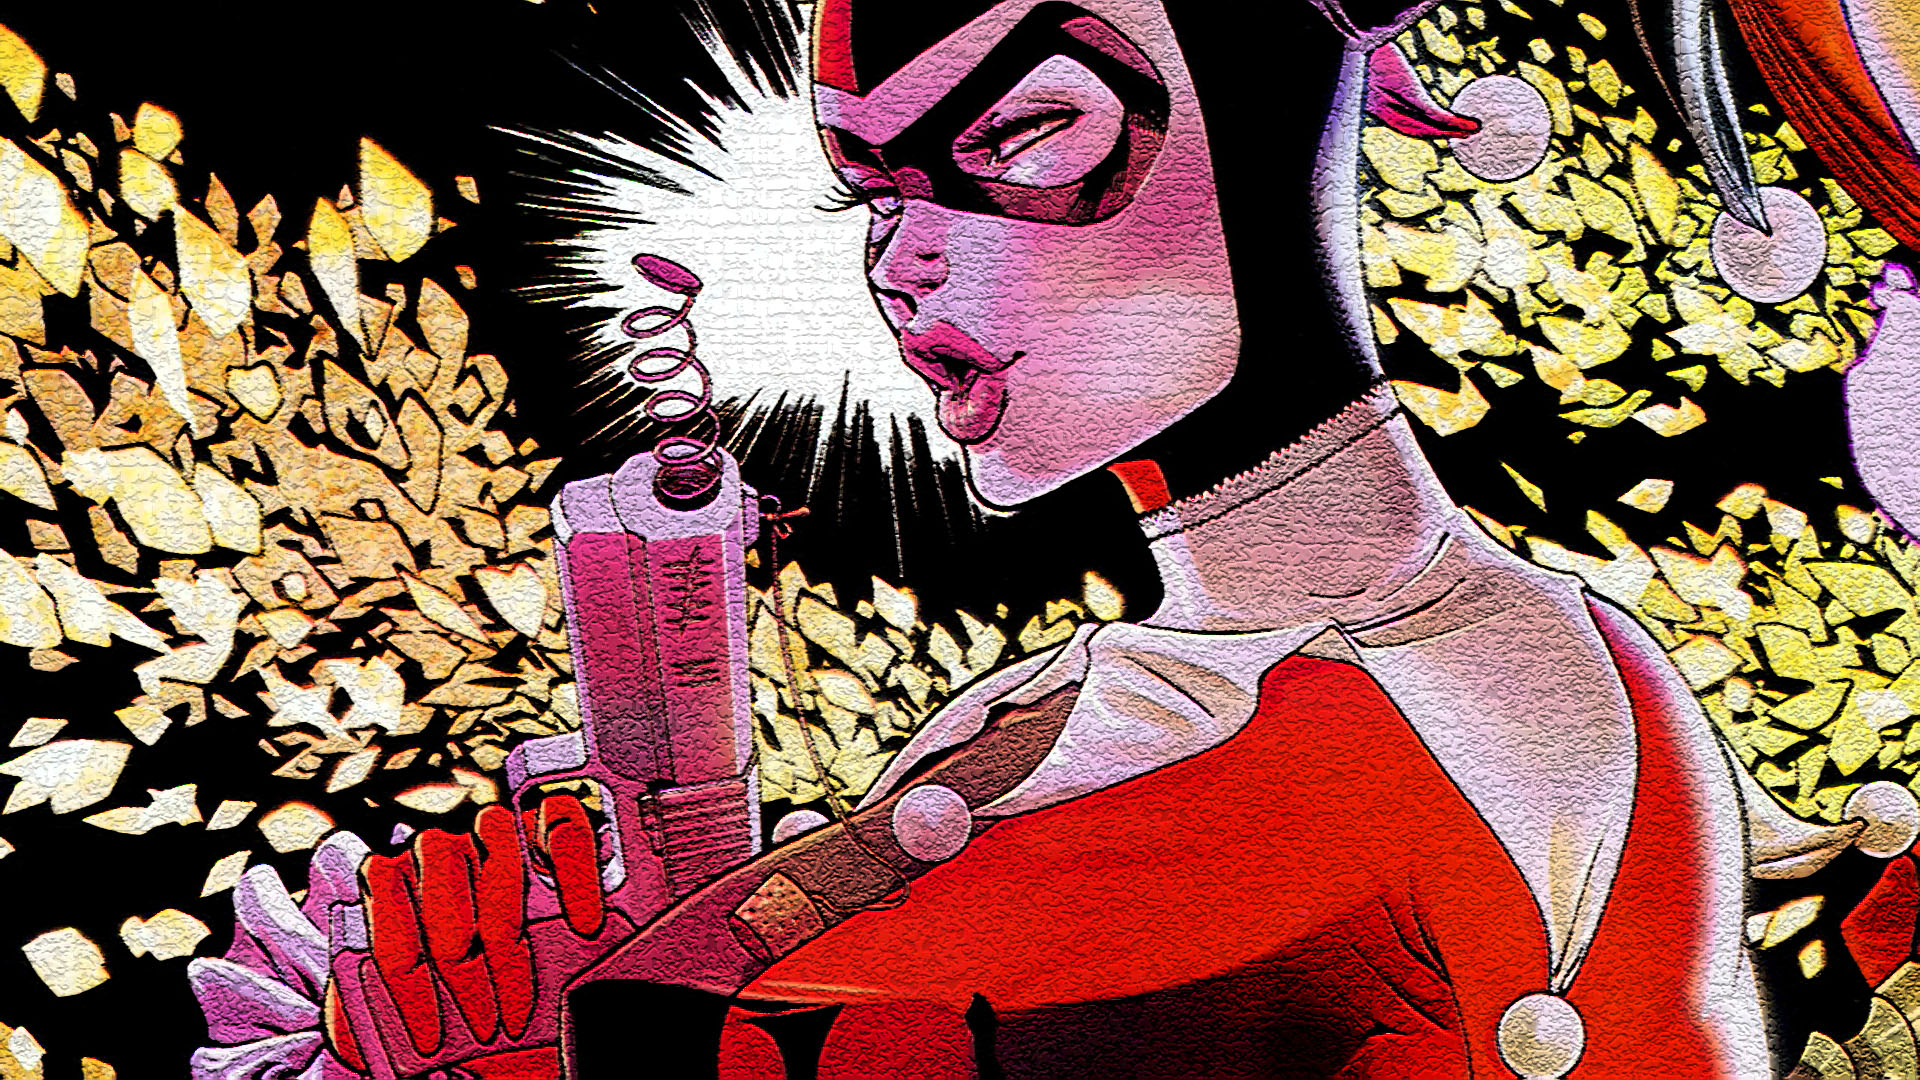 Harley Quinn Hd Iphone Wallpaper Gotham City Sirens Hd Wallpaper Background Image